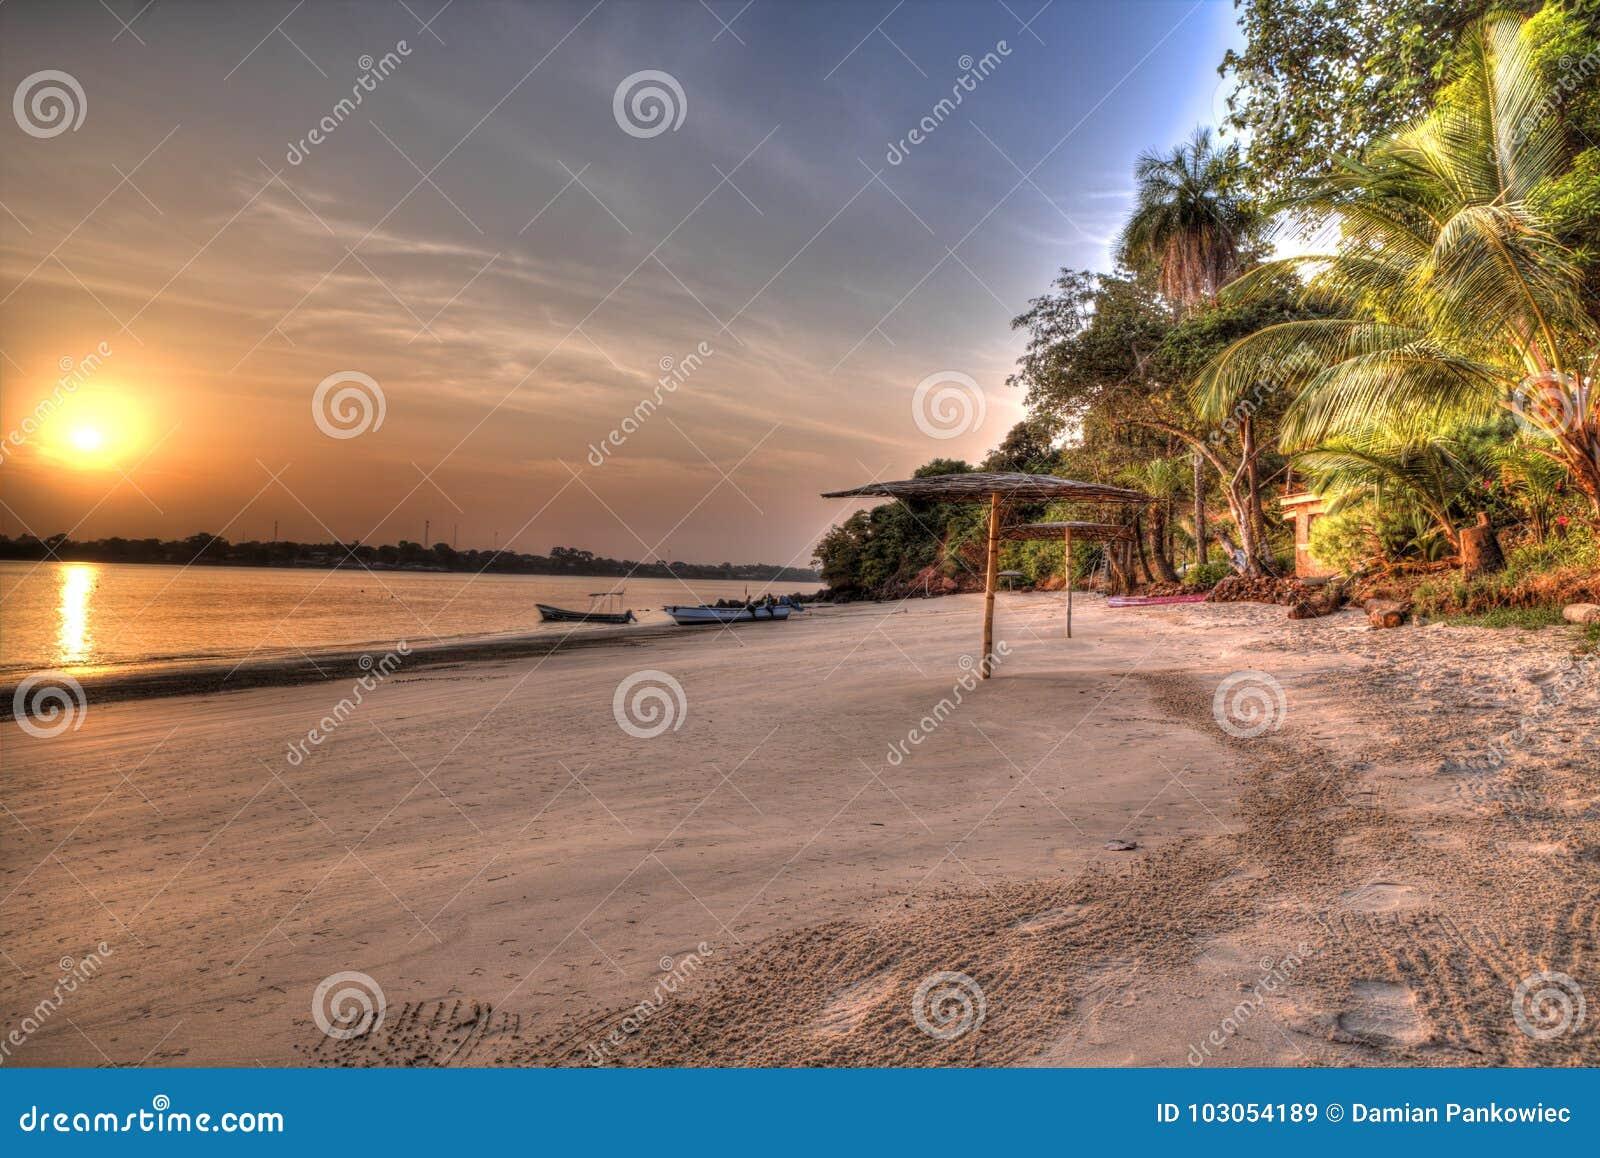 West Africa Guinea Bissau Bijagos island